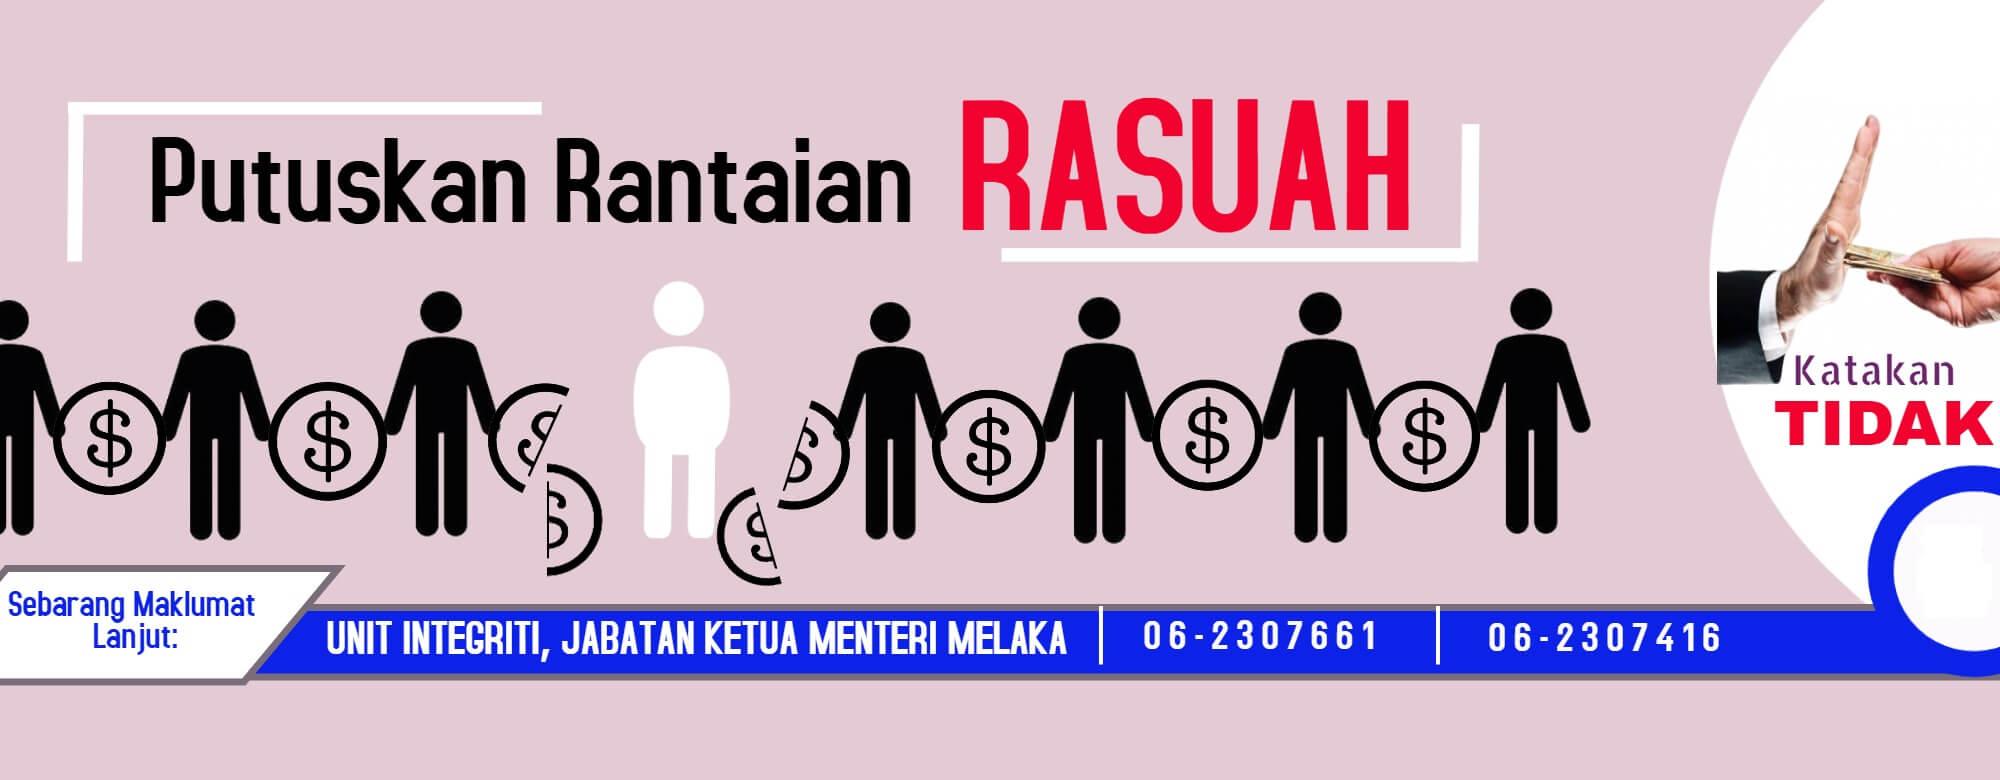 integriti_rasuah_2020